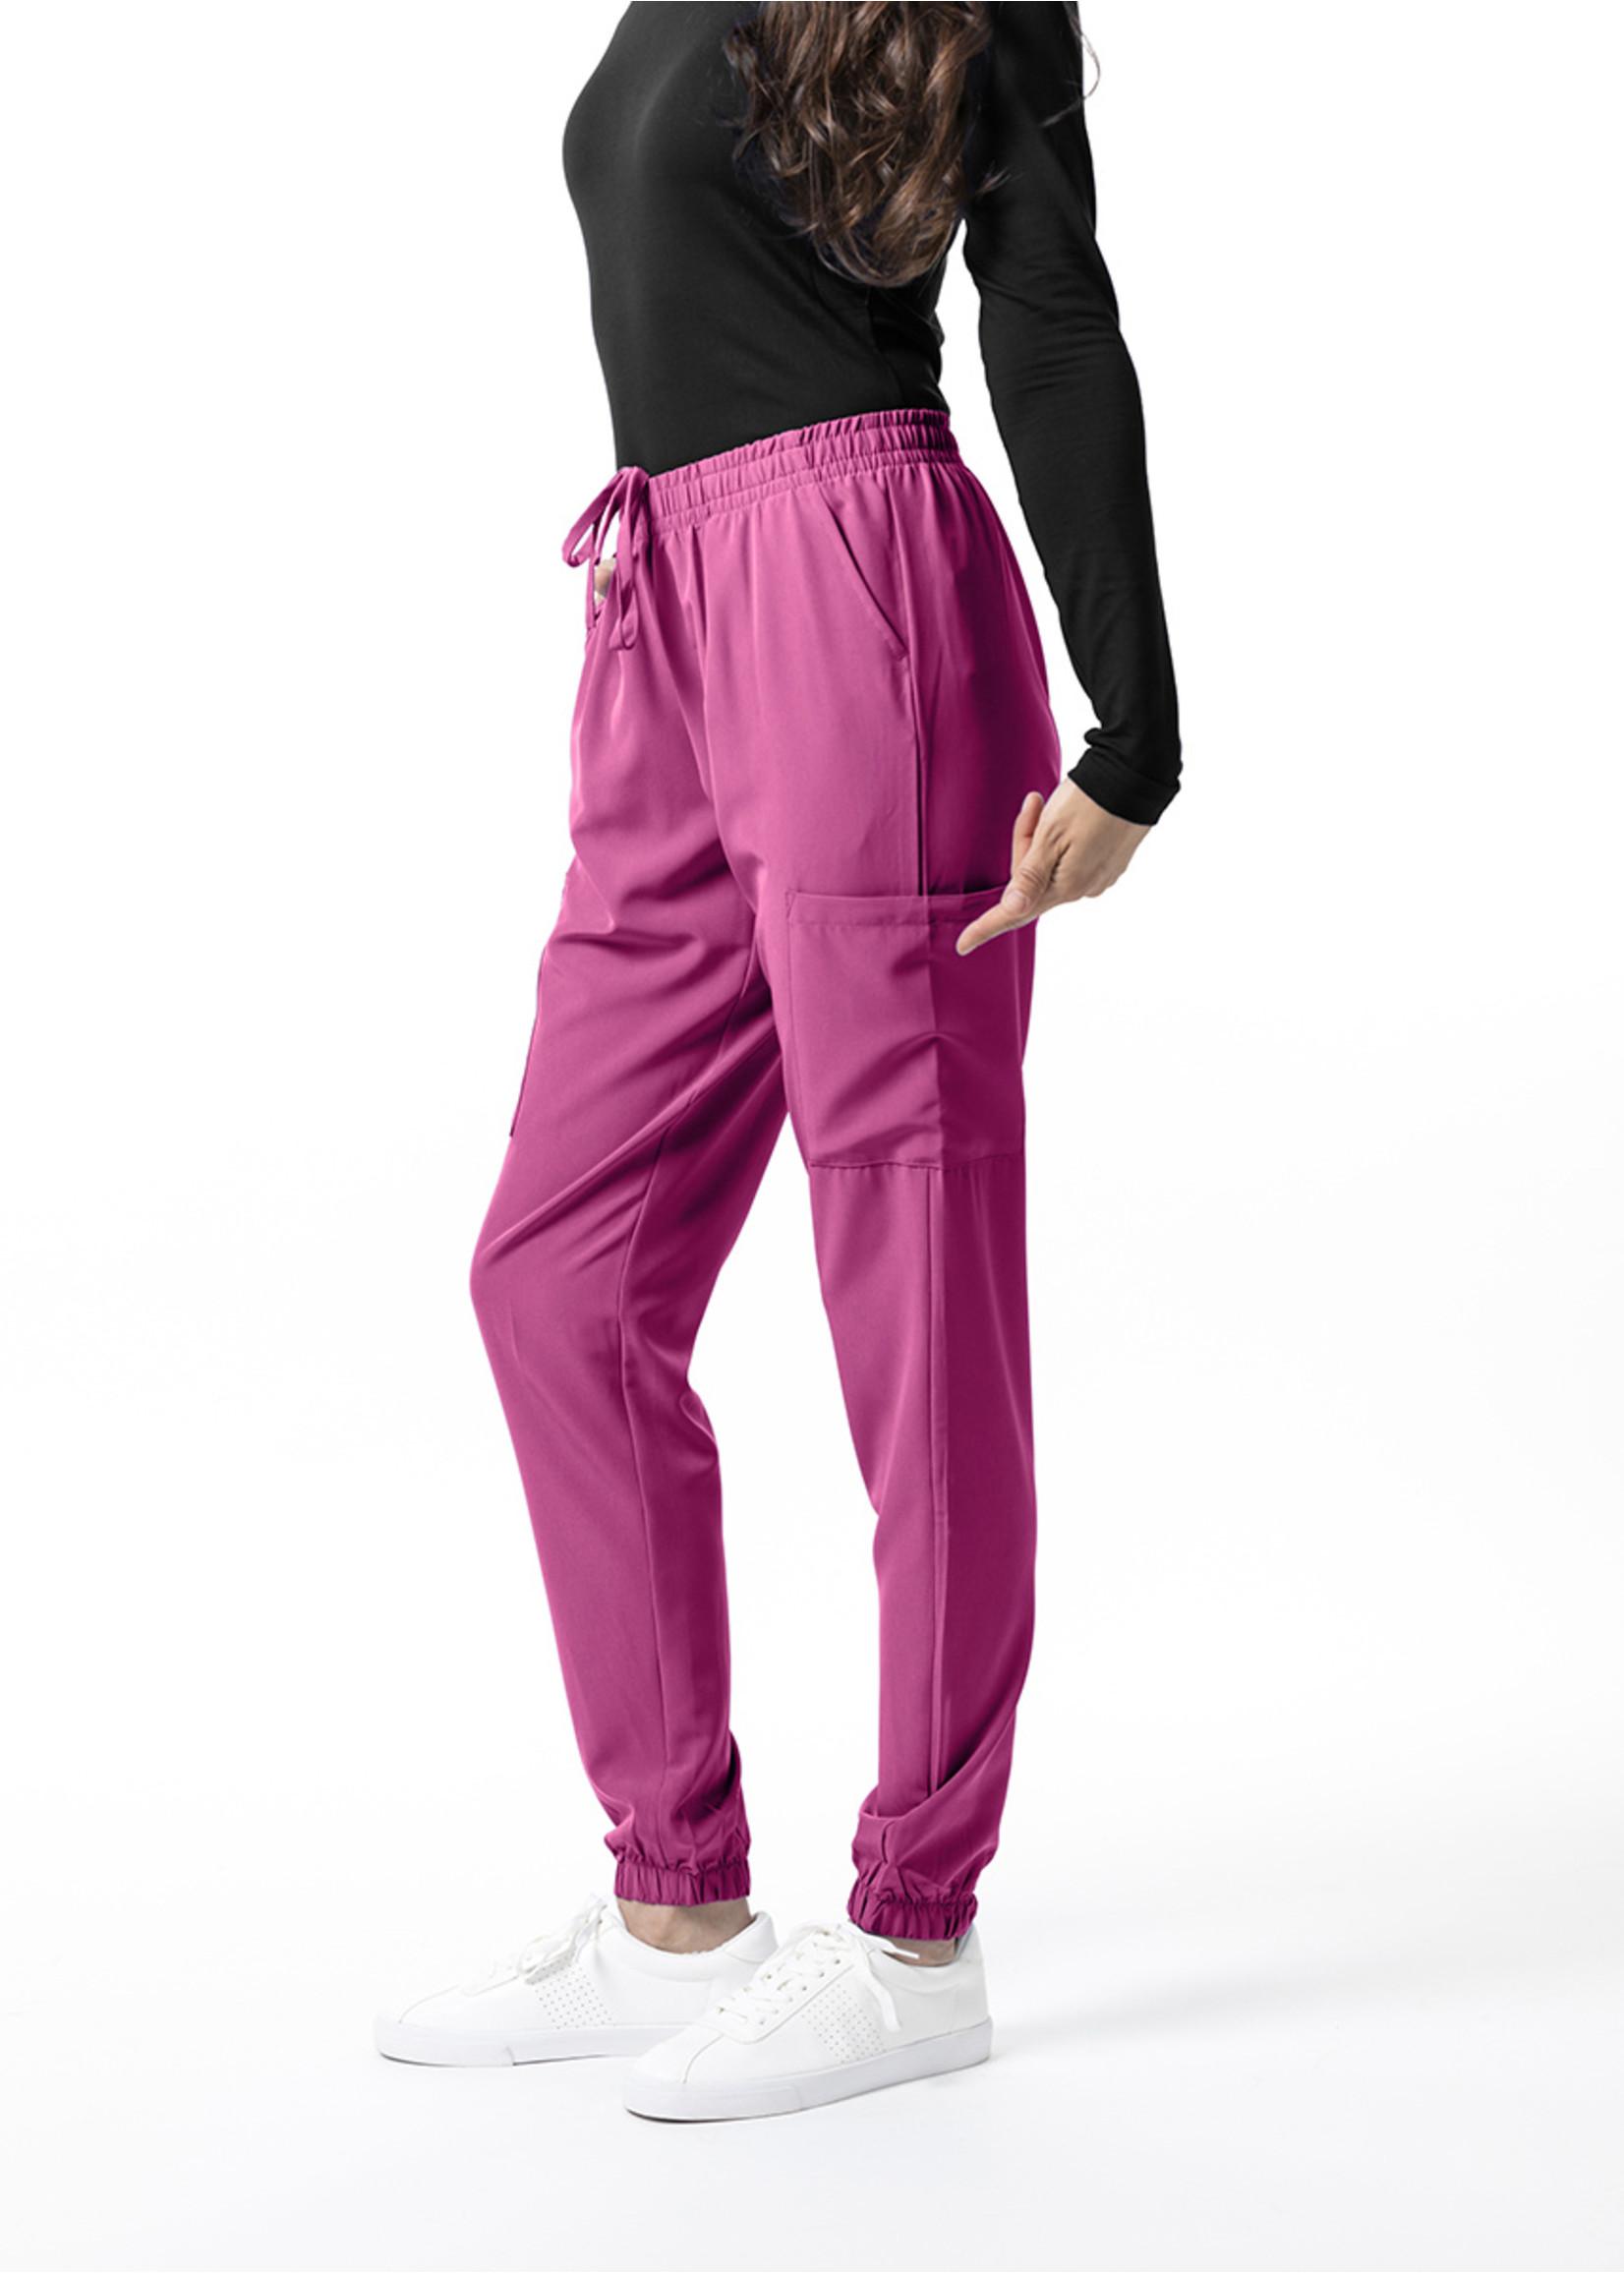 Greentown Canada Inc. Pantalon Jogger Zinnia 18-1046